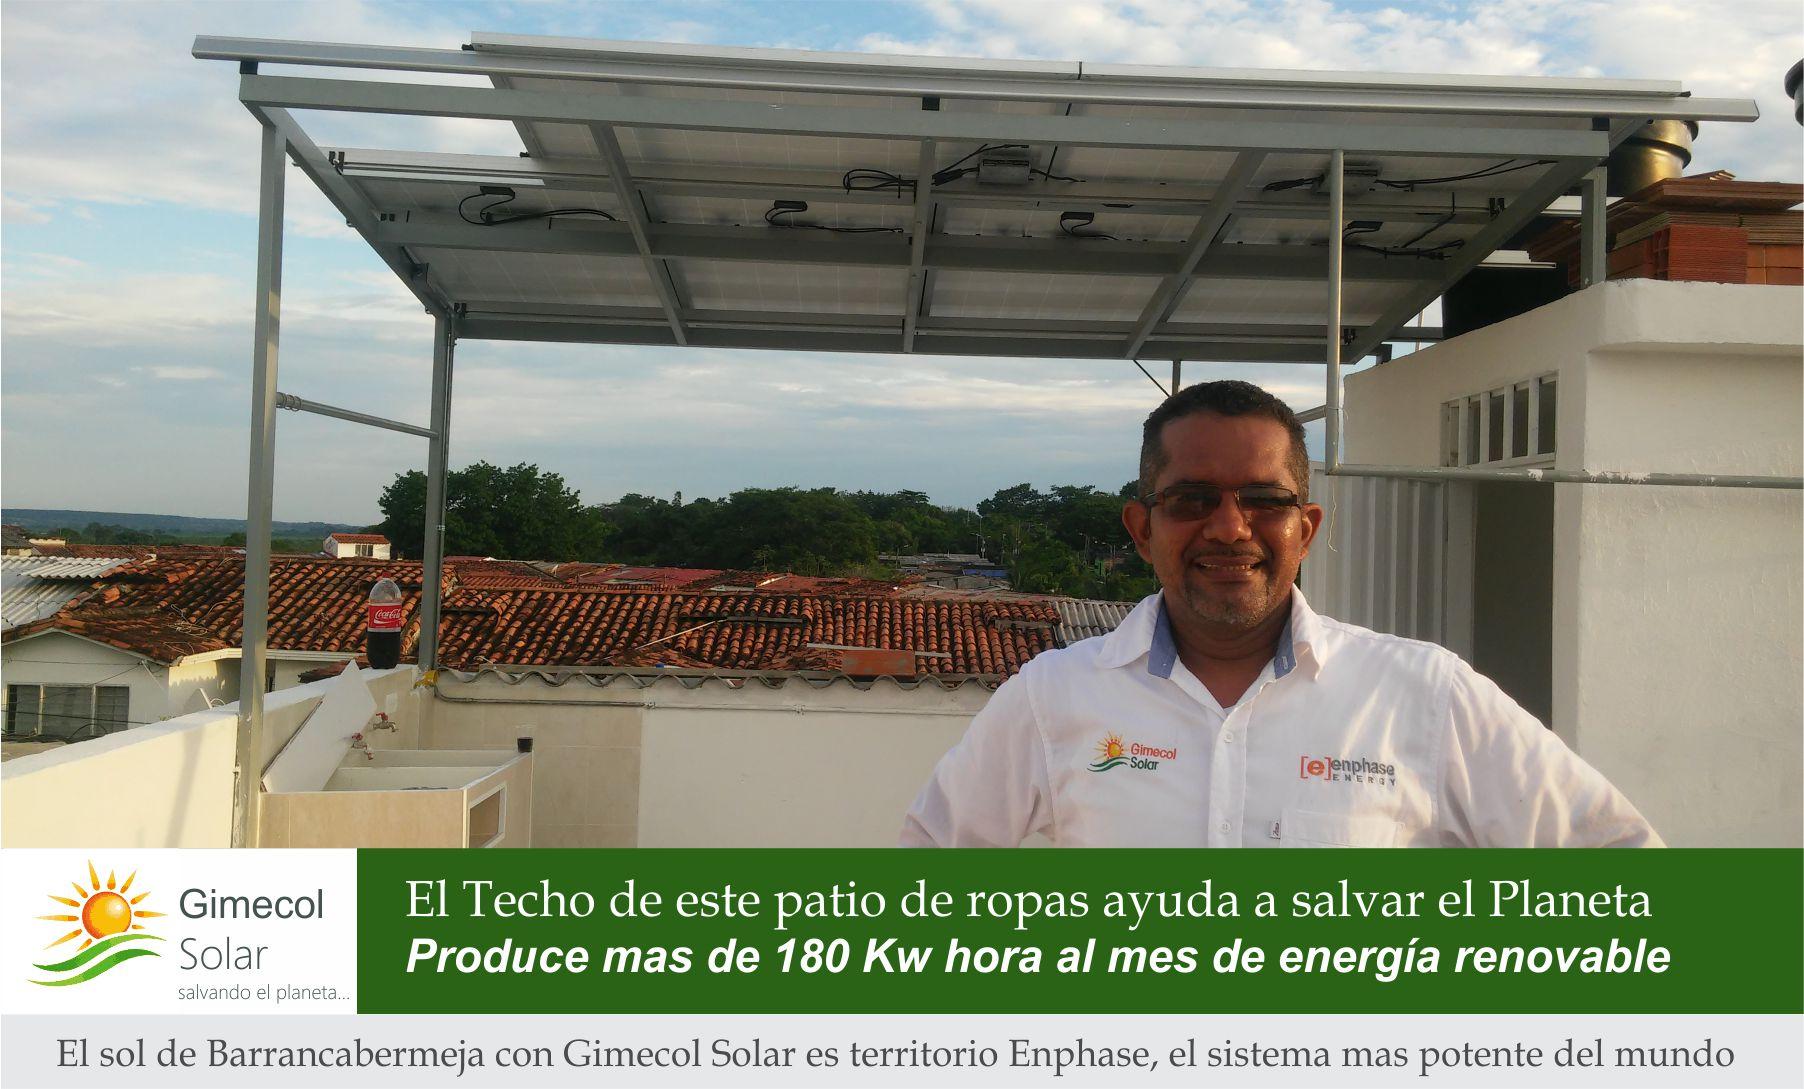 techo_fotovoltaico_jca_gimecol_solar_enphase